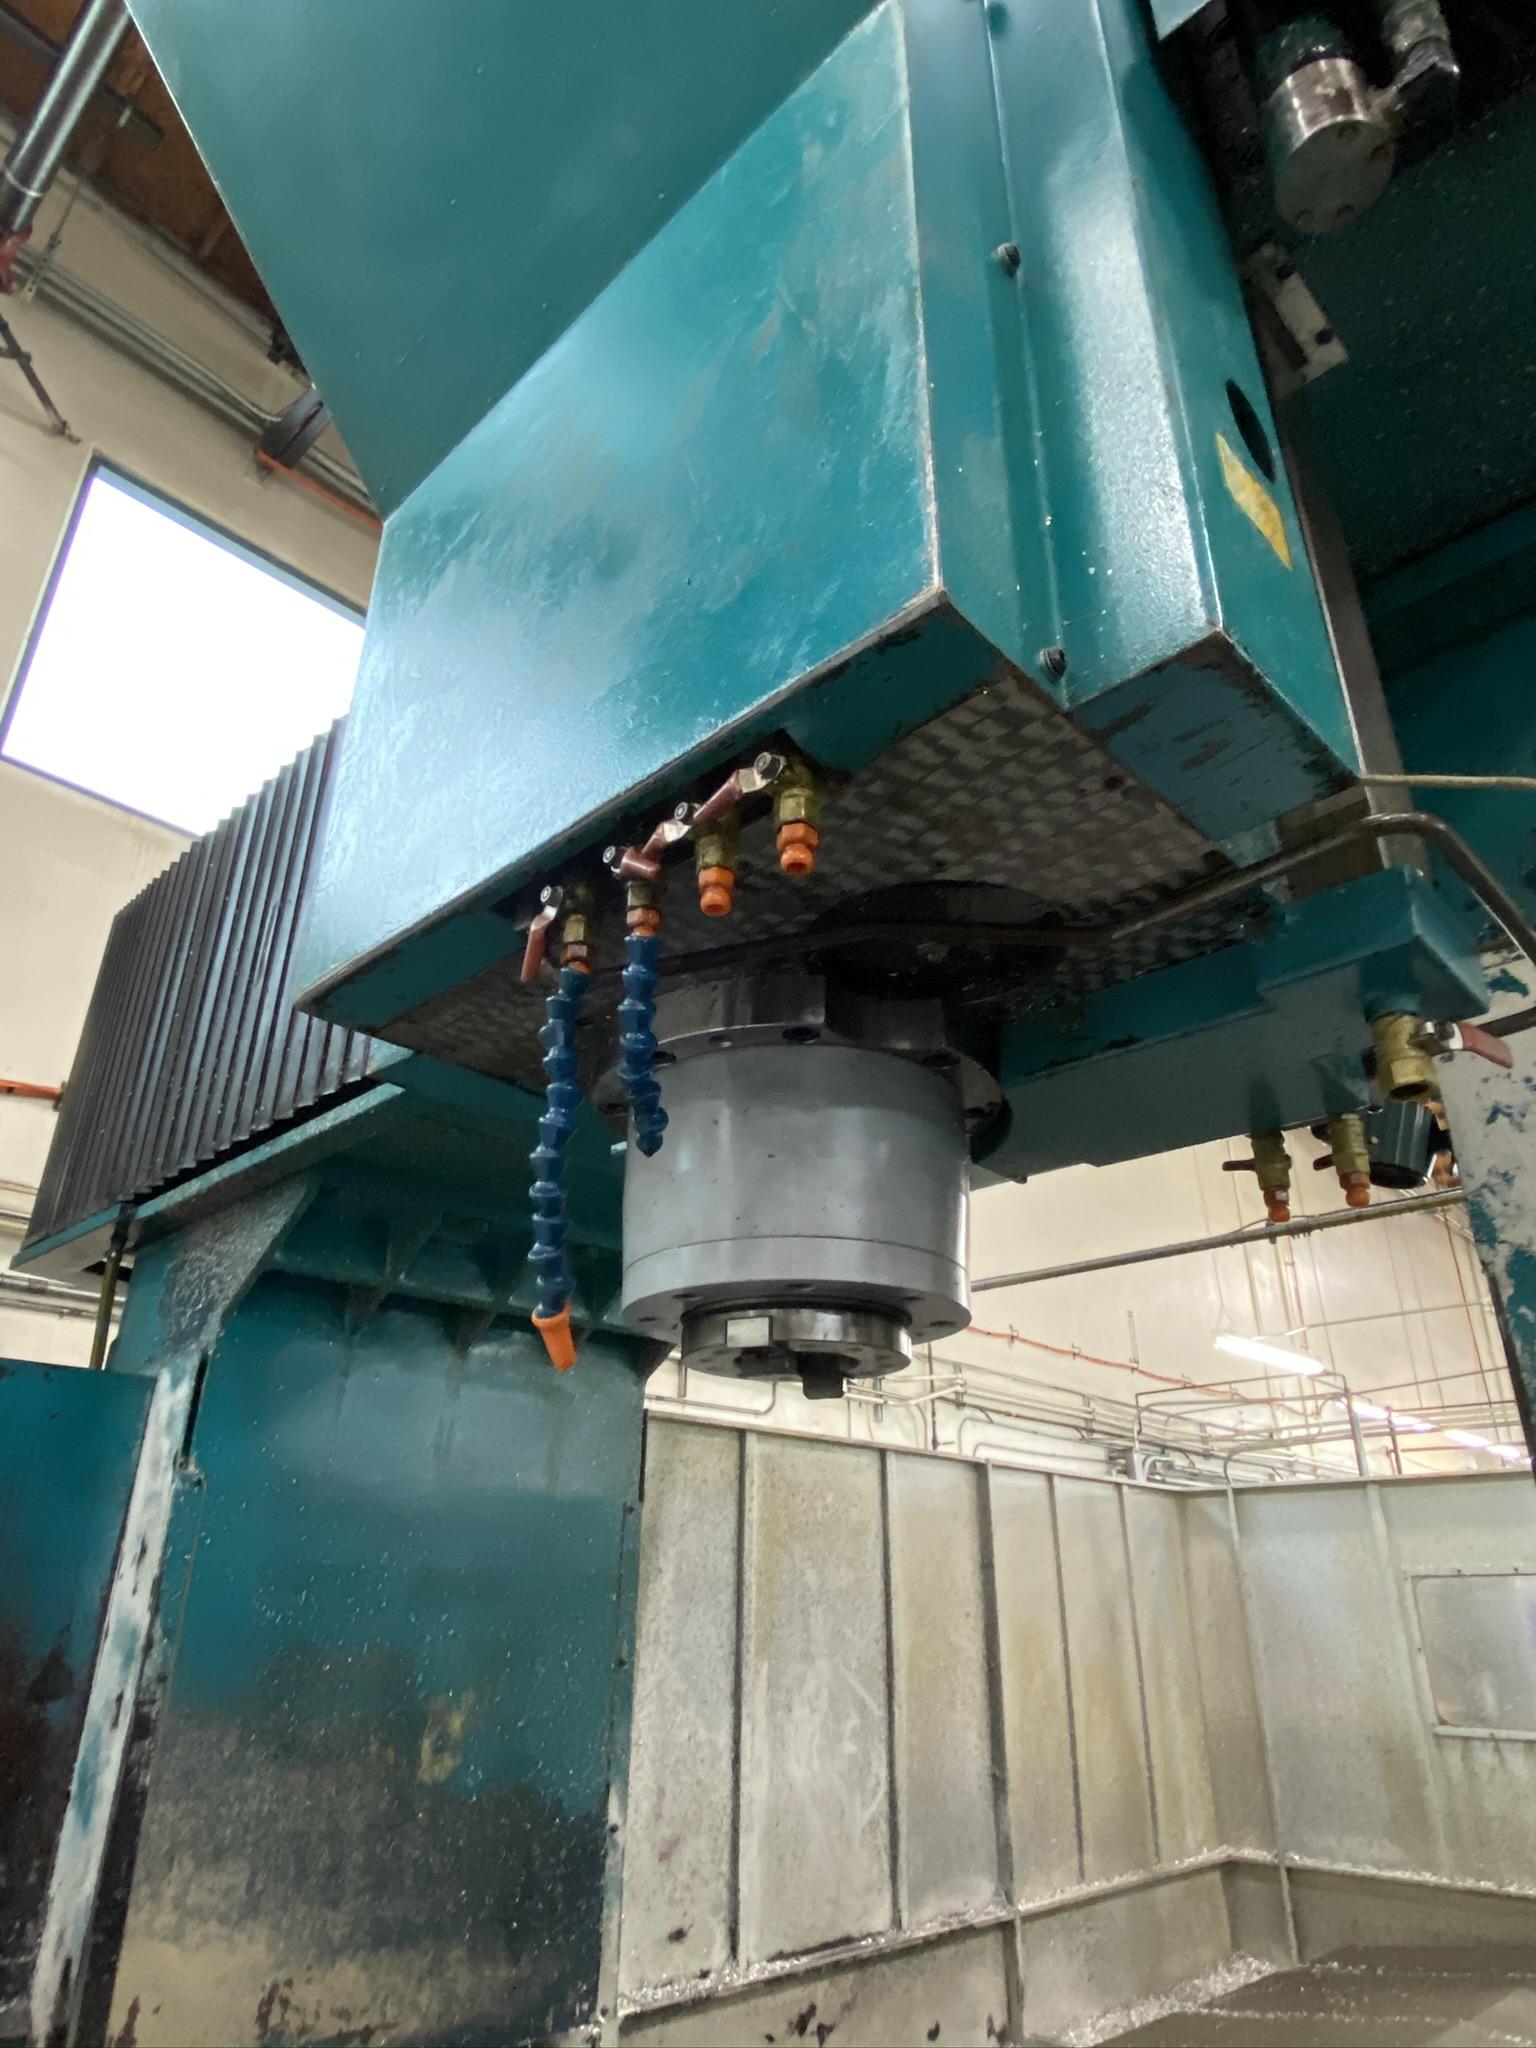 2005 SIGMA CNC DOUBLE COLUMN MACHINING CENTER, MODEL SDV-3219, FANUC 18IMB CNC CONTROL - Image 7 of 31